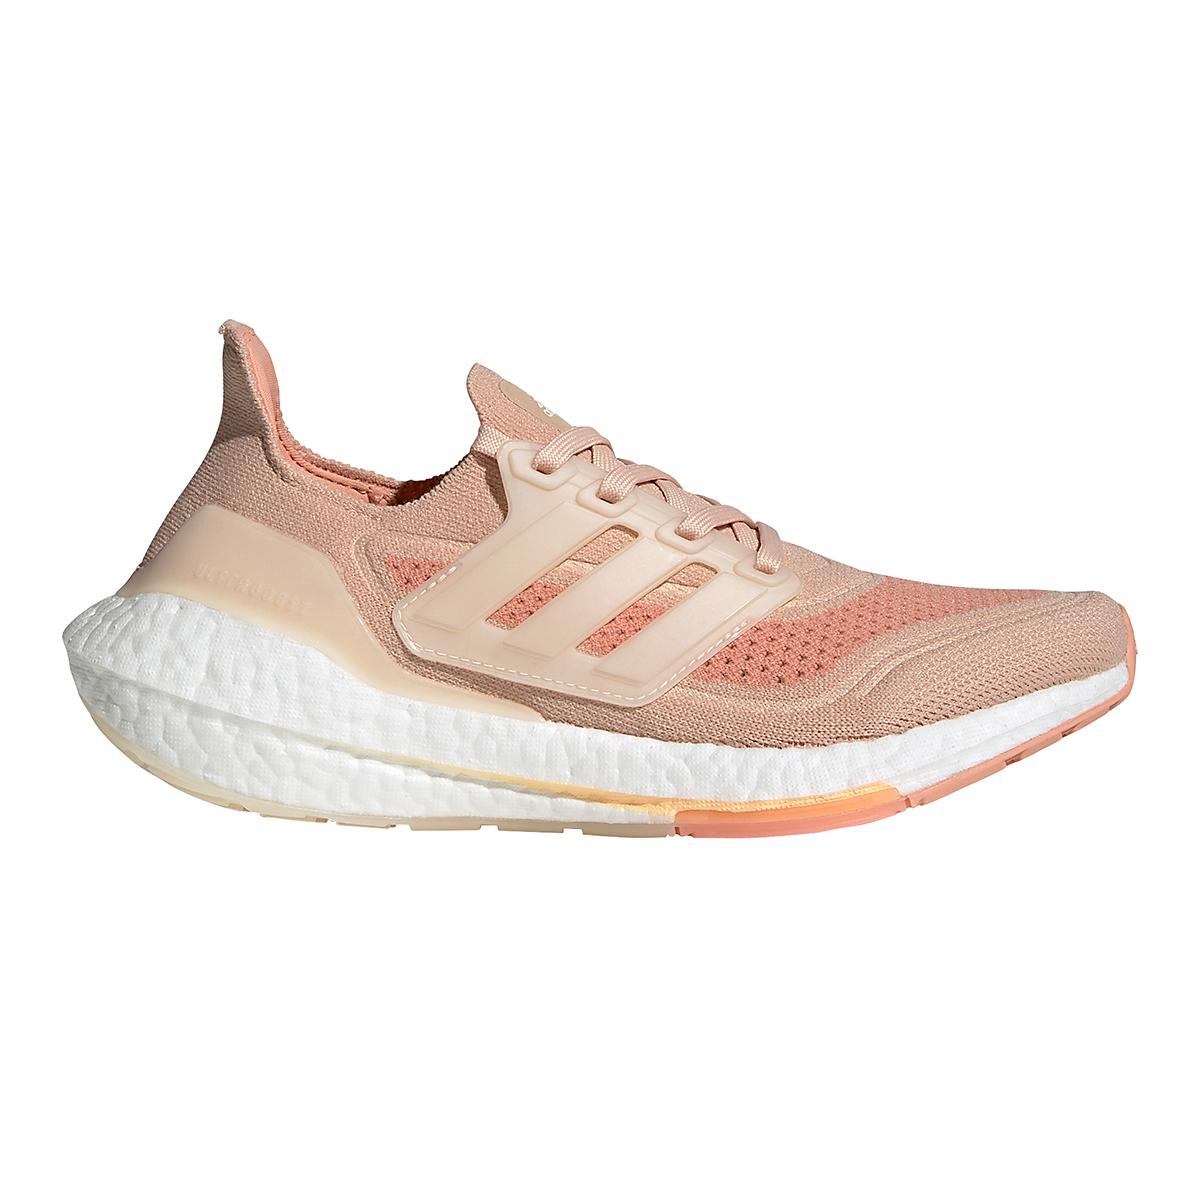 Women's Adidas Ultraboost 21 Running Shoe - Color: Halo Blush/Wonder White/Ambient Blush - Size: 5 - Width: Regular, Halo Blush/Wonder White/Ambient Blush, large, image 1